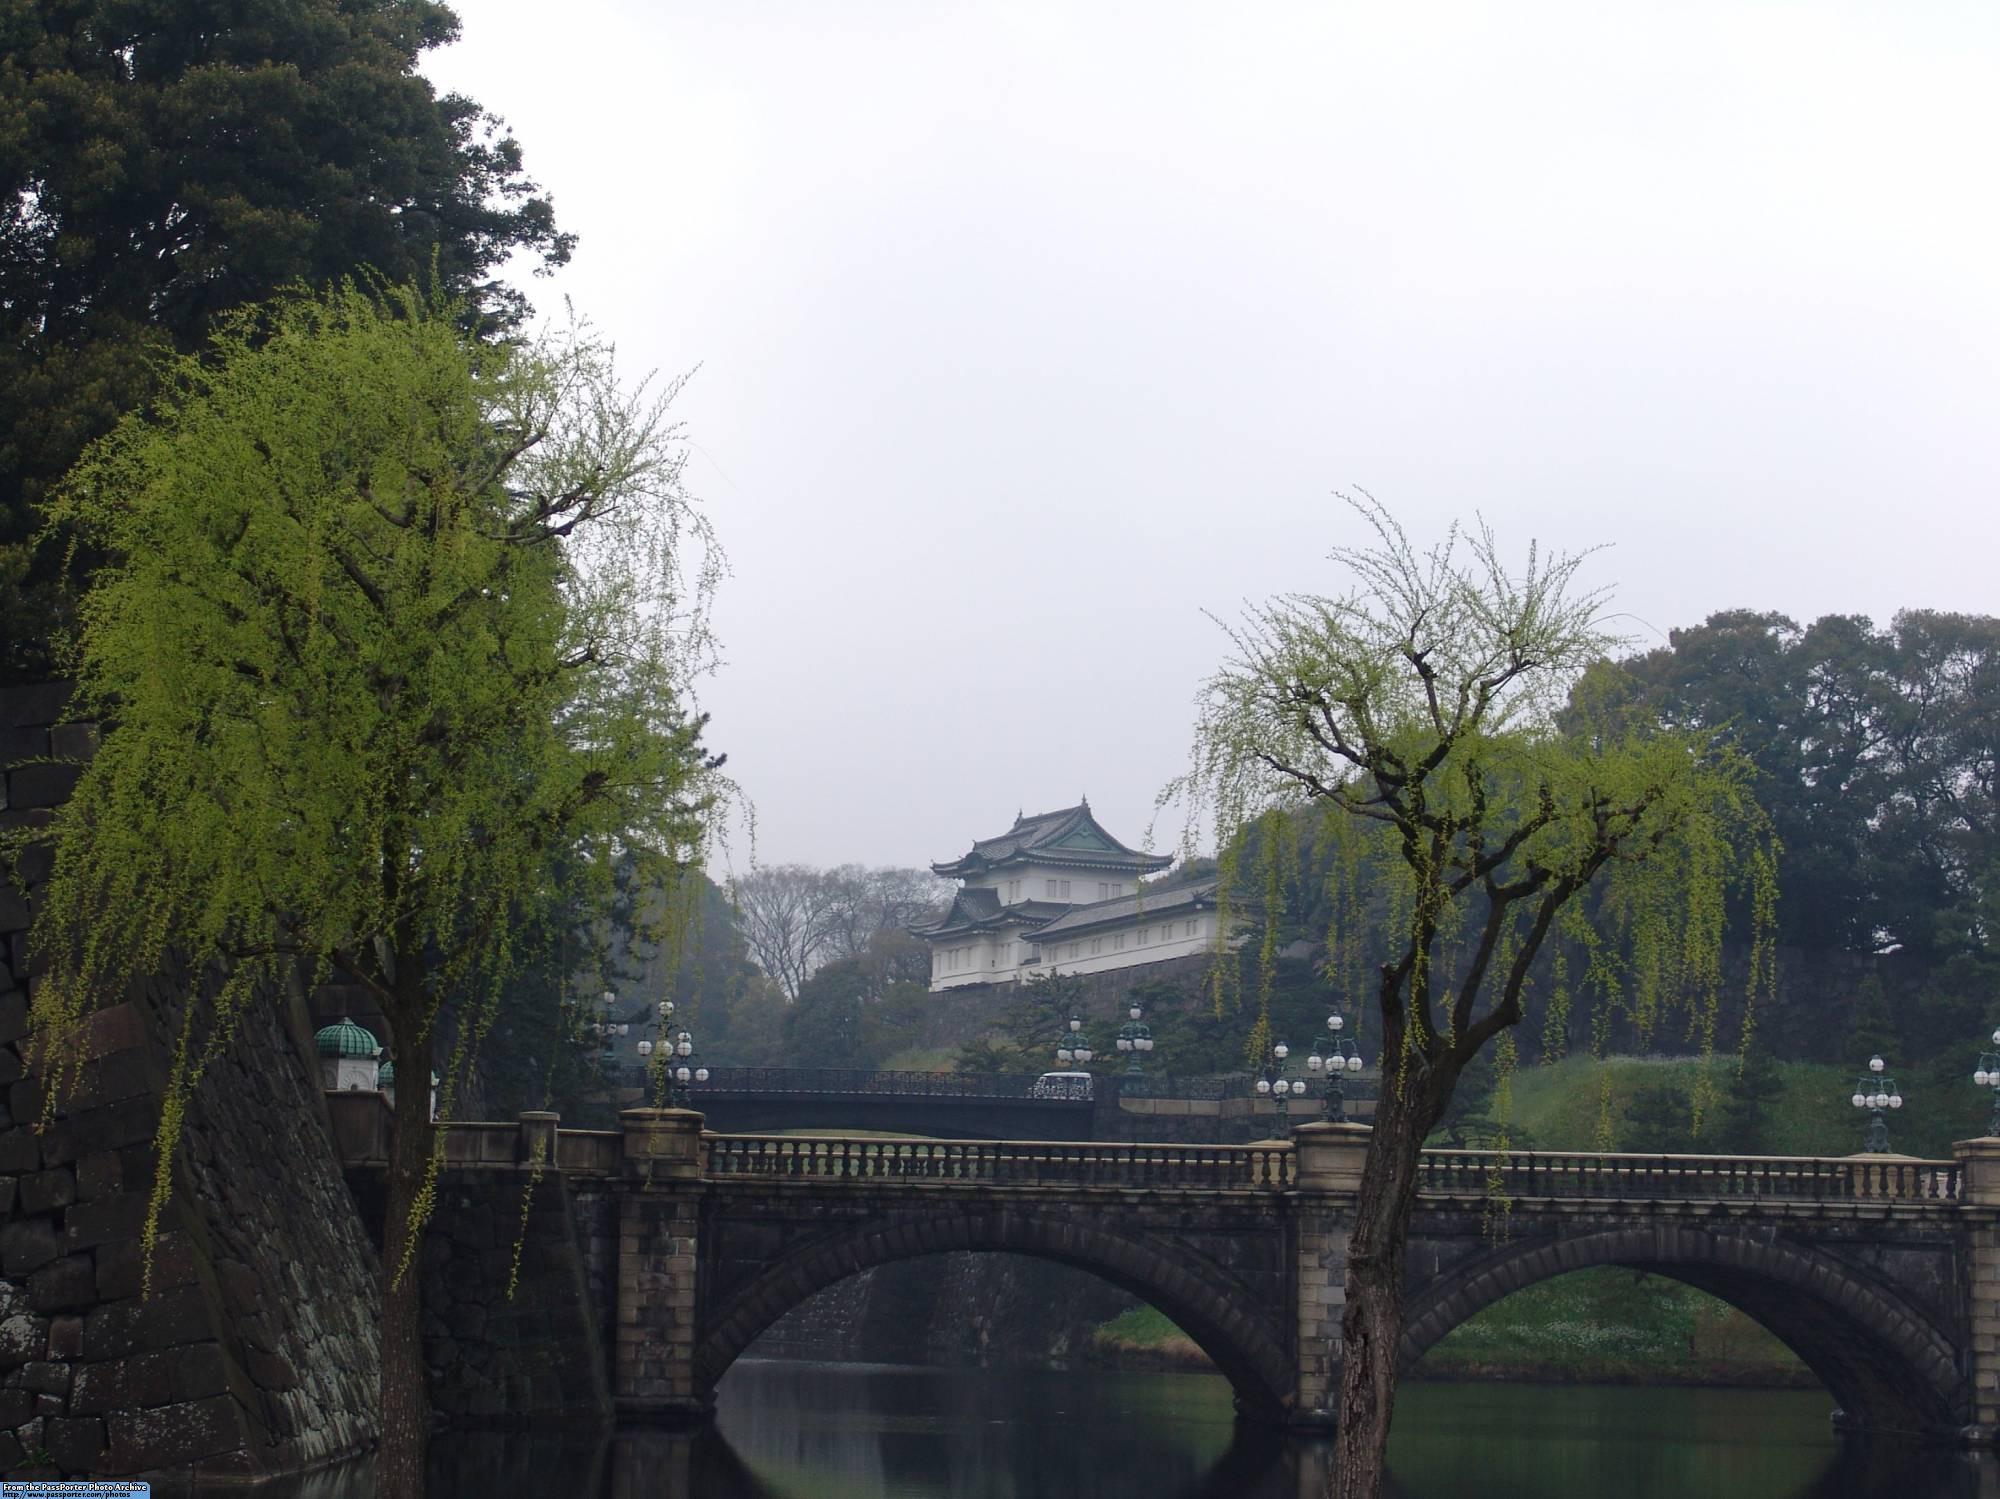 Explore Tokyo while visiting the Tokyo Disney Resort | PassPorter.com